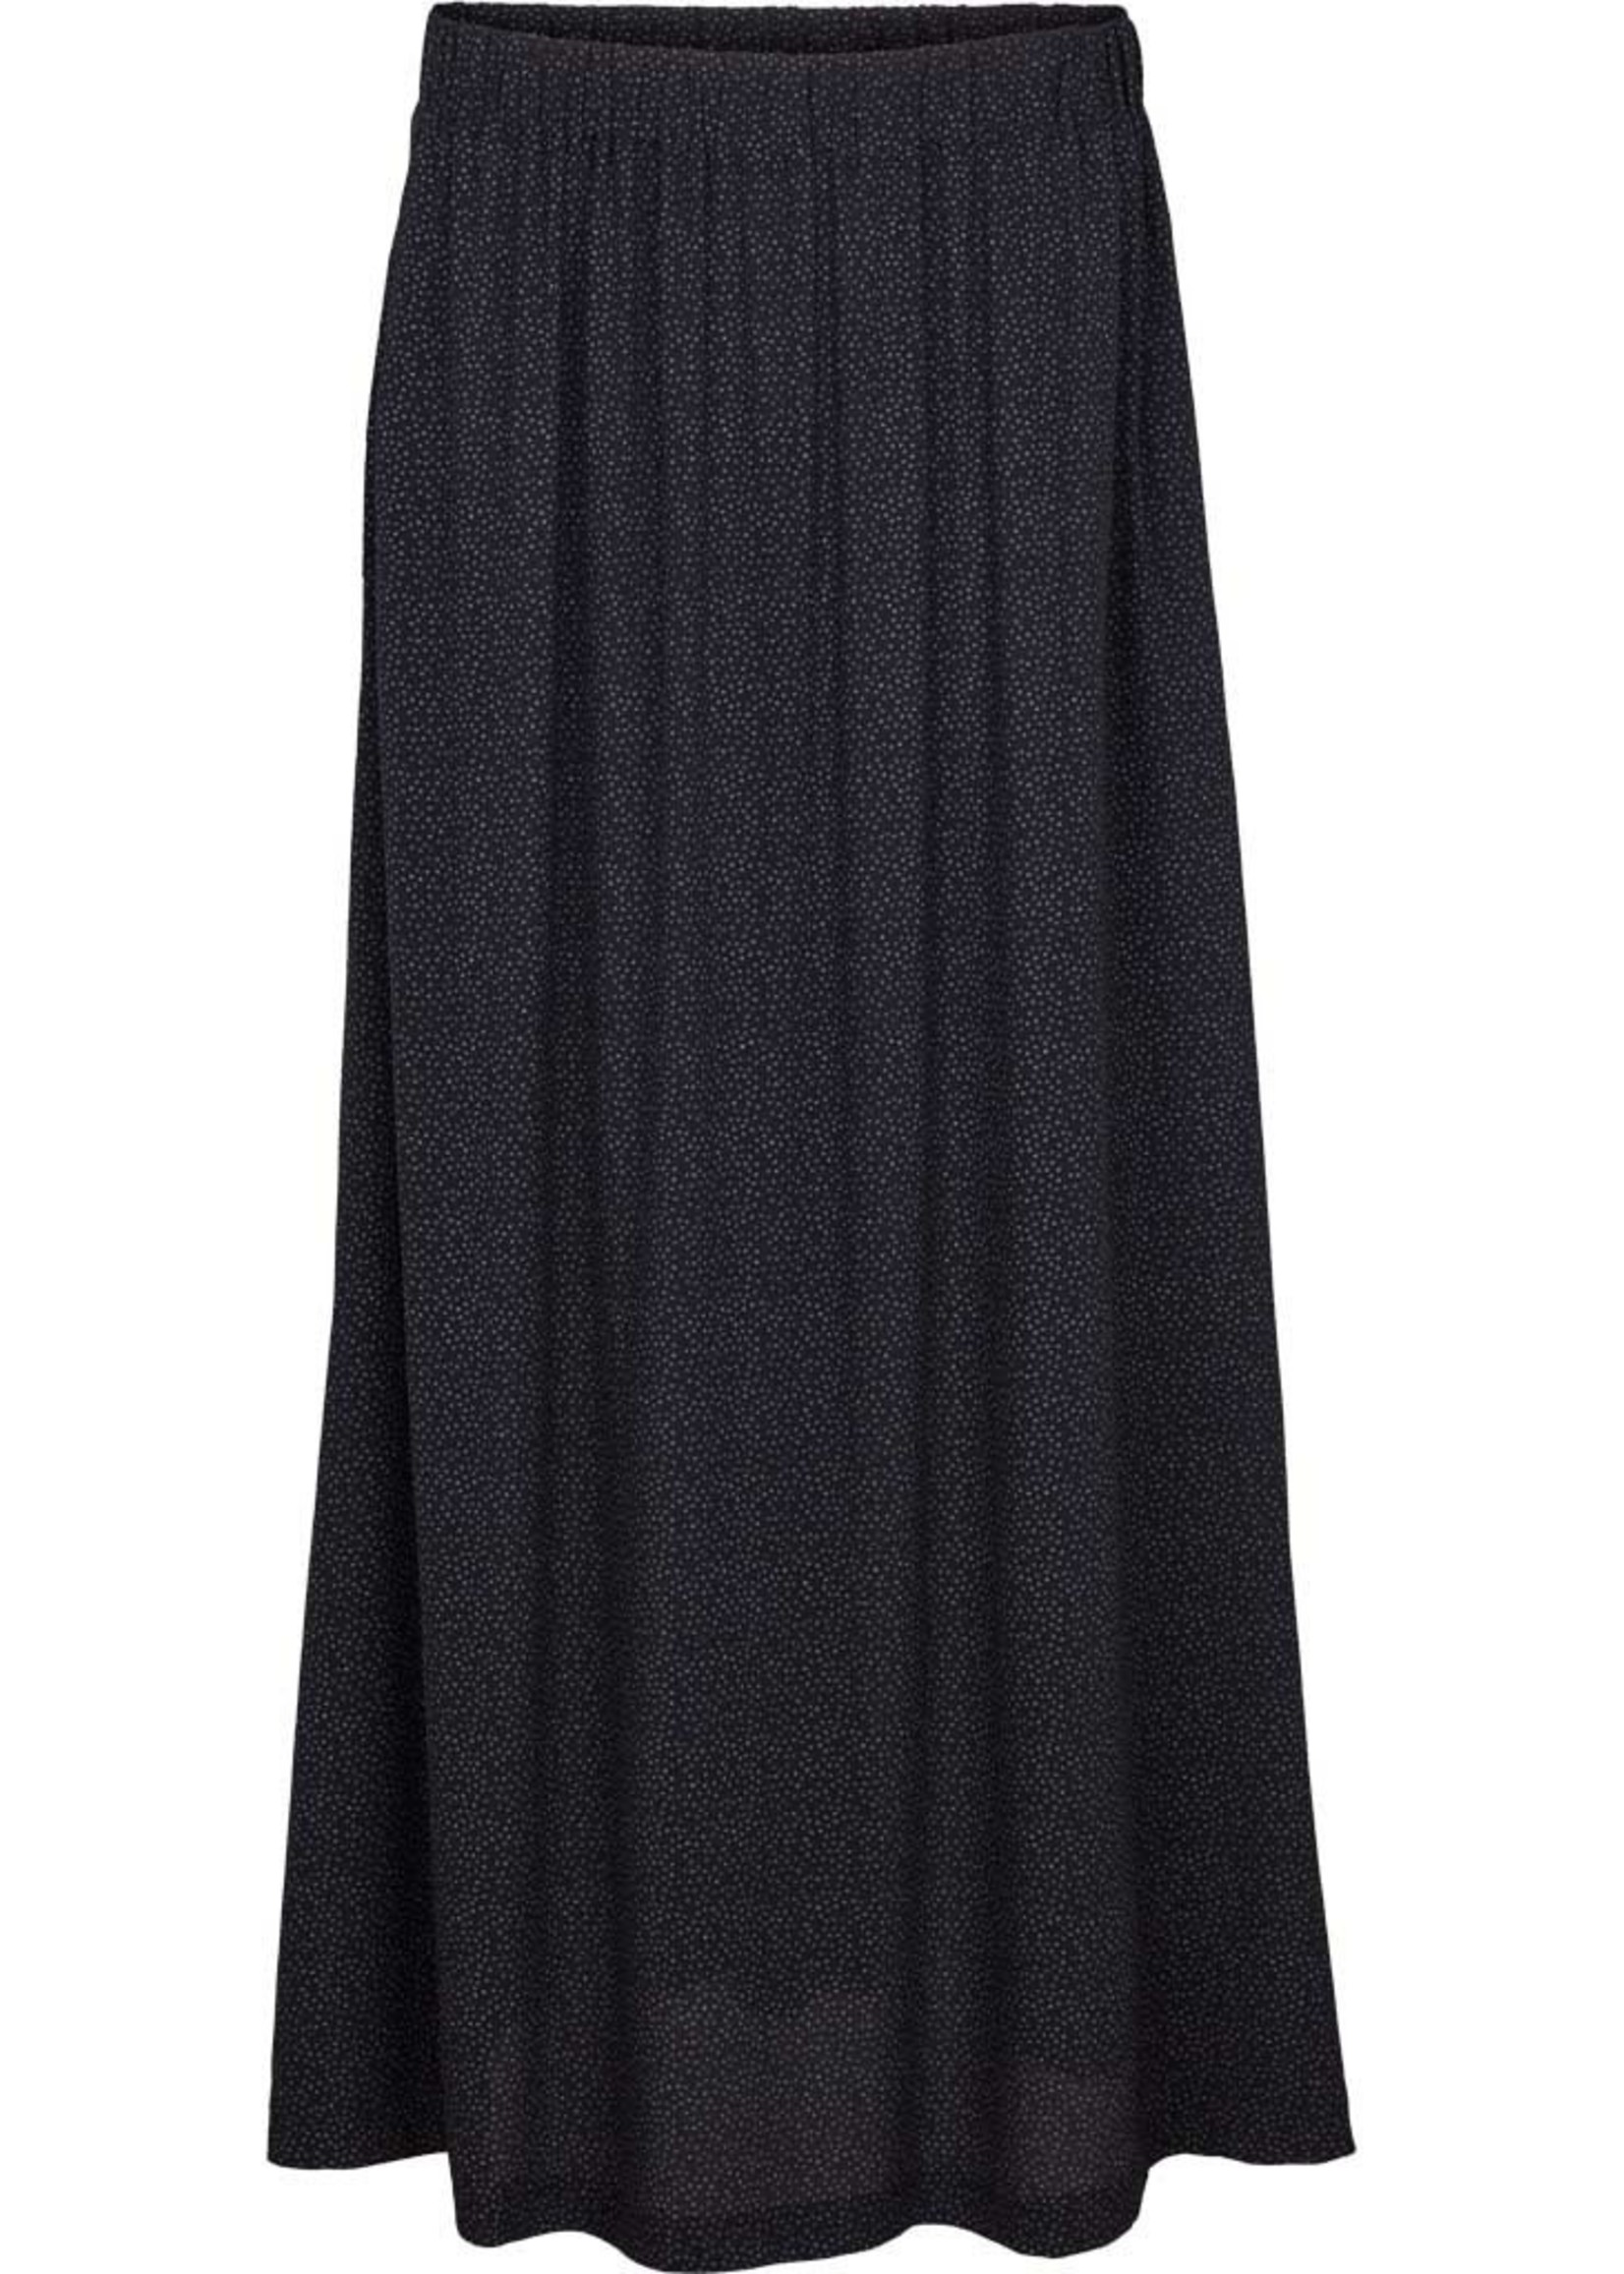 Basic Apparel Betina Skirt